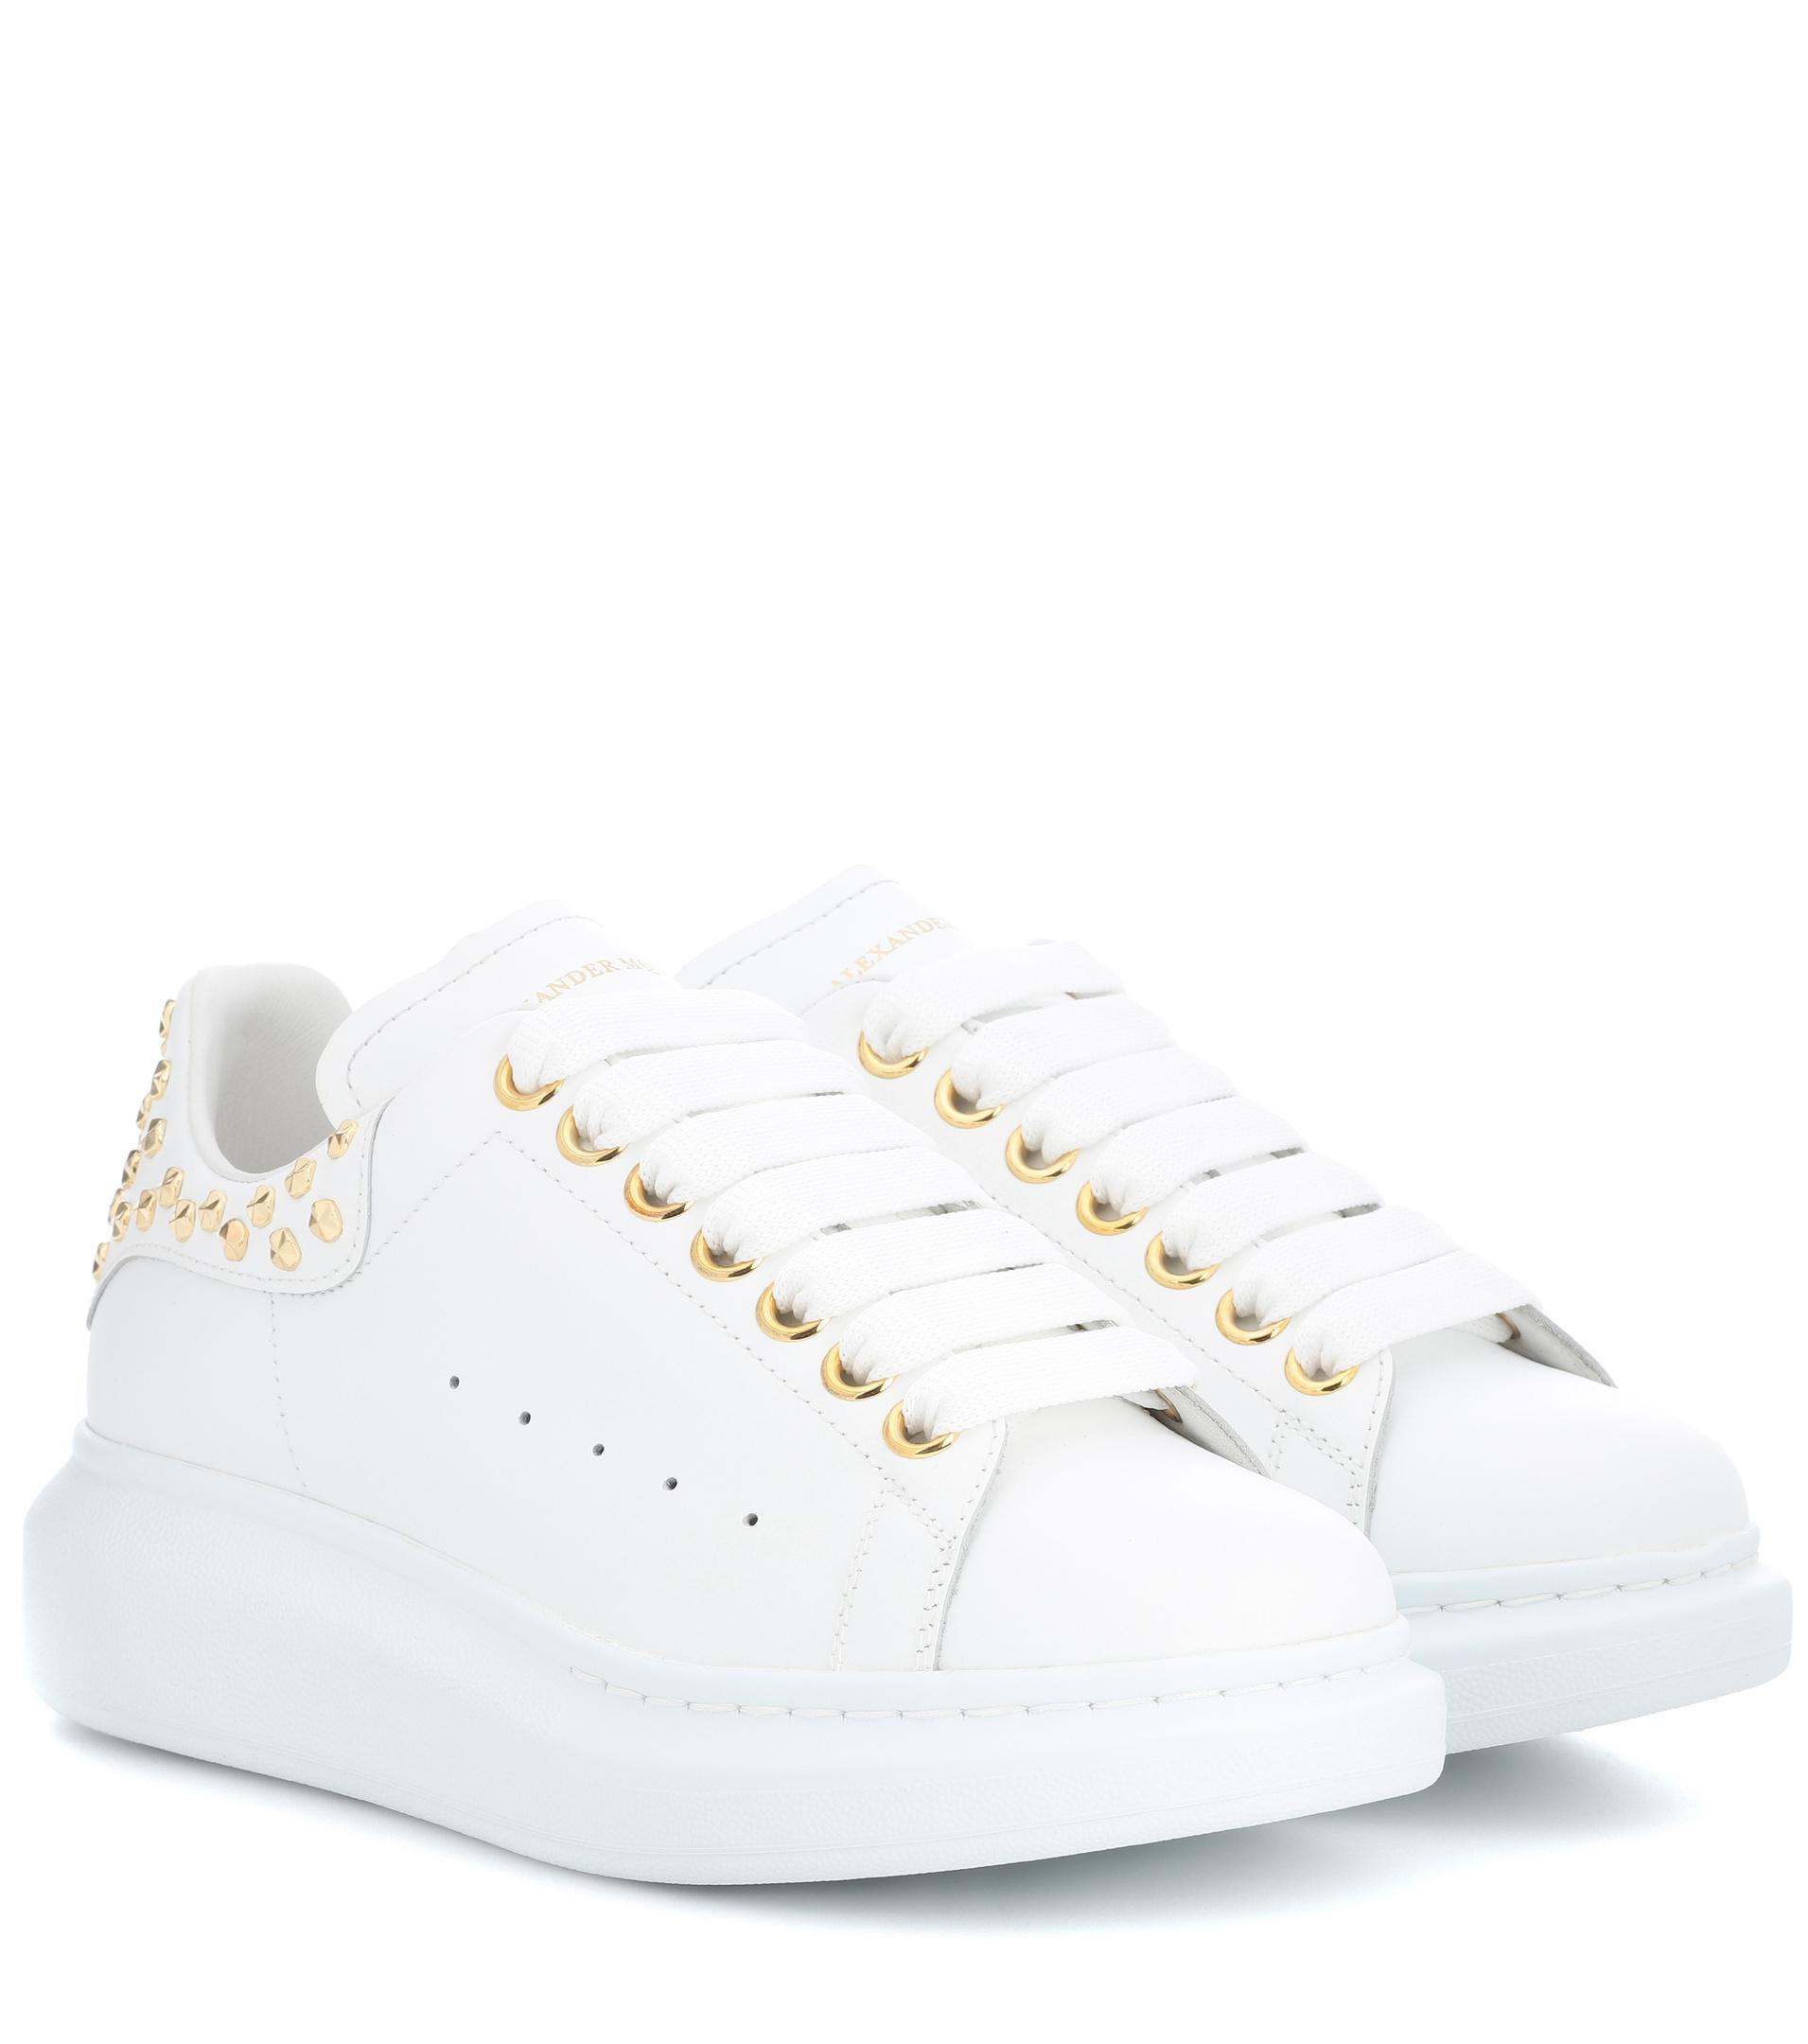 Lyst - Baskets en cuir clouté Alexander McQueen en coloris Blanc 0de71aa00cf